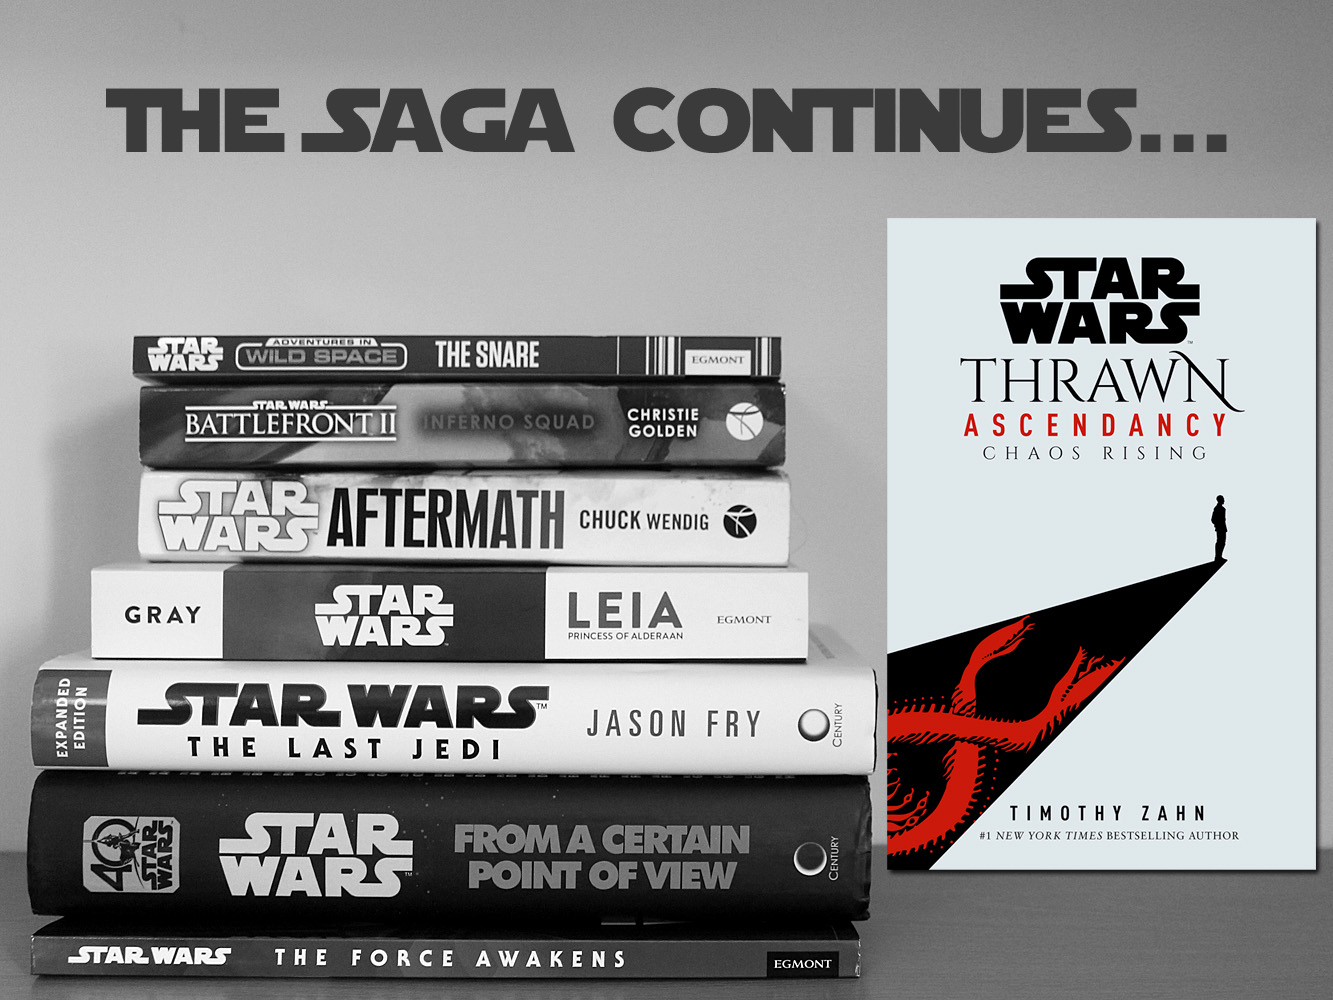 The Saga Continues, Thrawn Ascendancy Chaos Rising, Image Del Rey